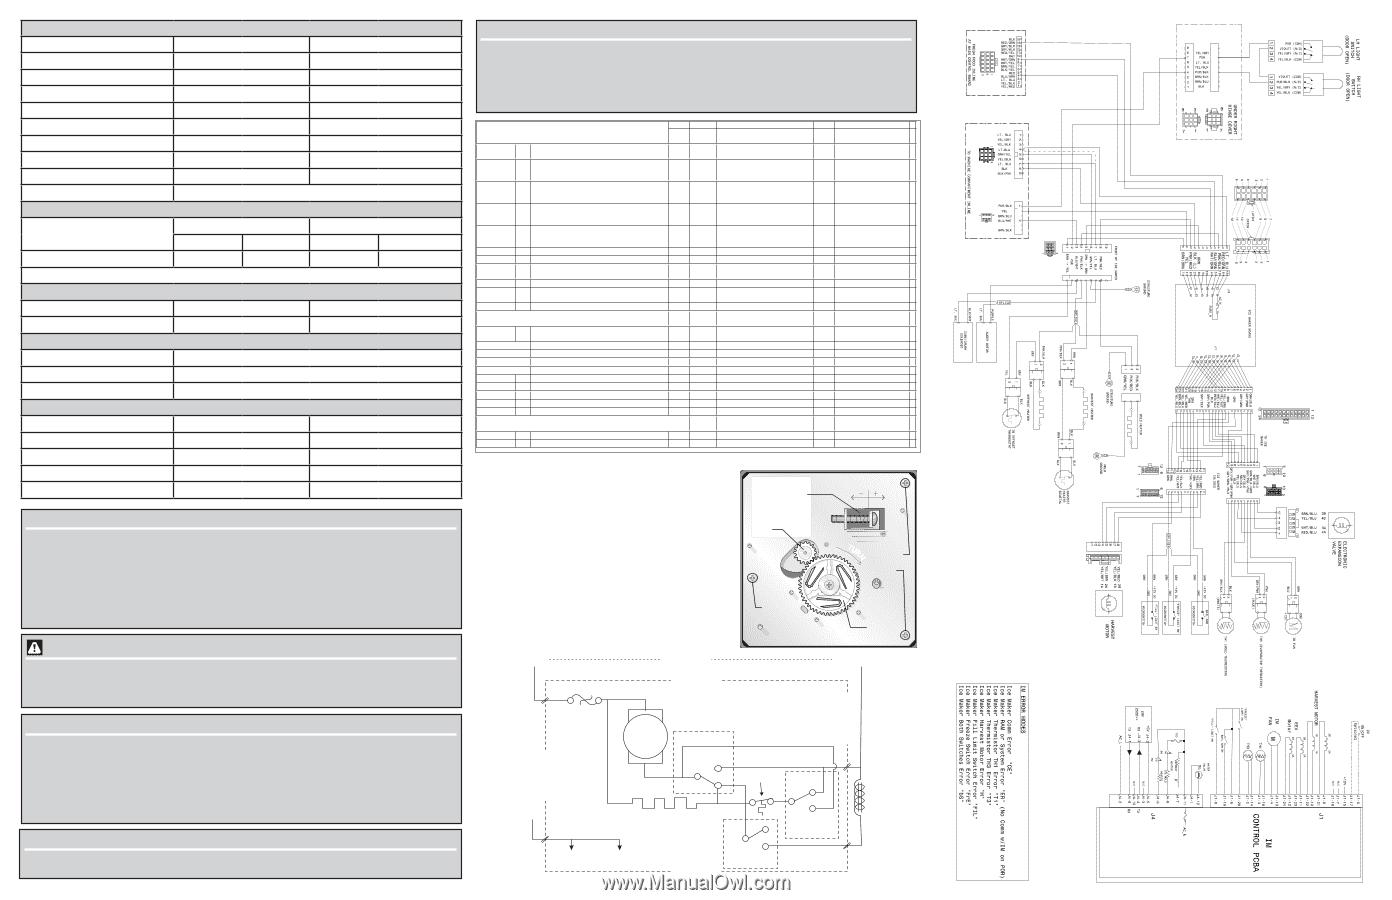 Frigidaire Ice Maker Wiring Diagram from www.manualowl.com